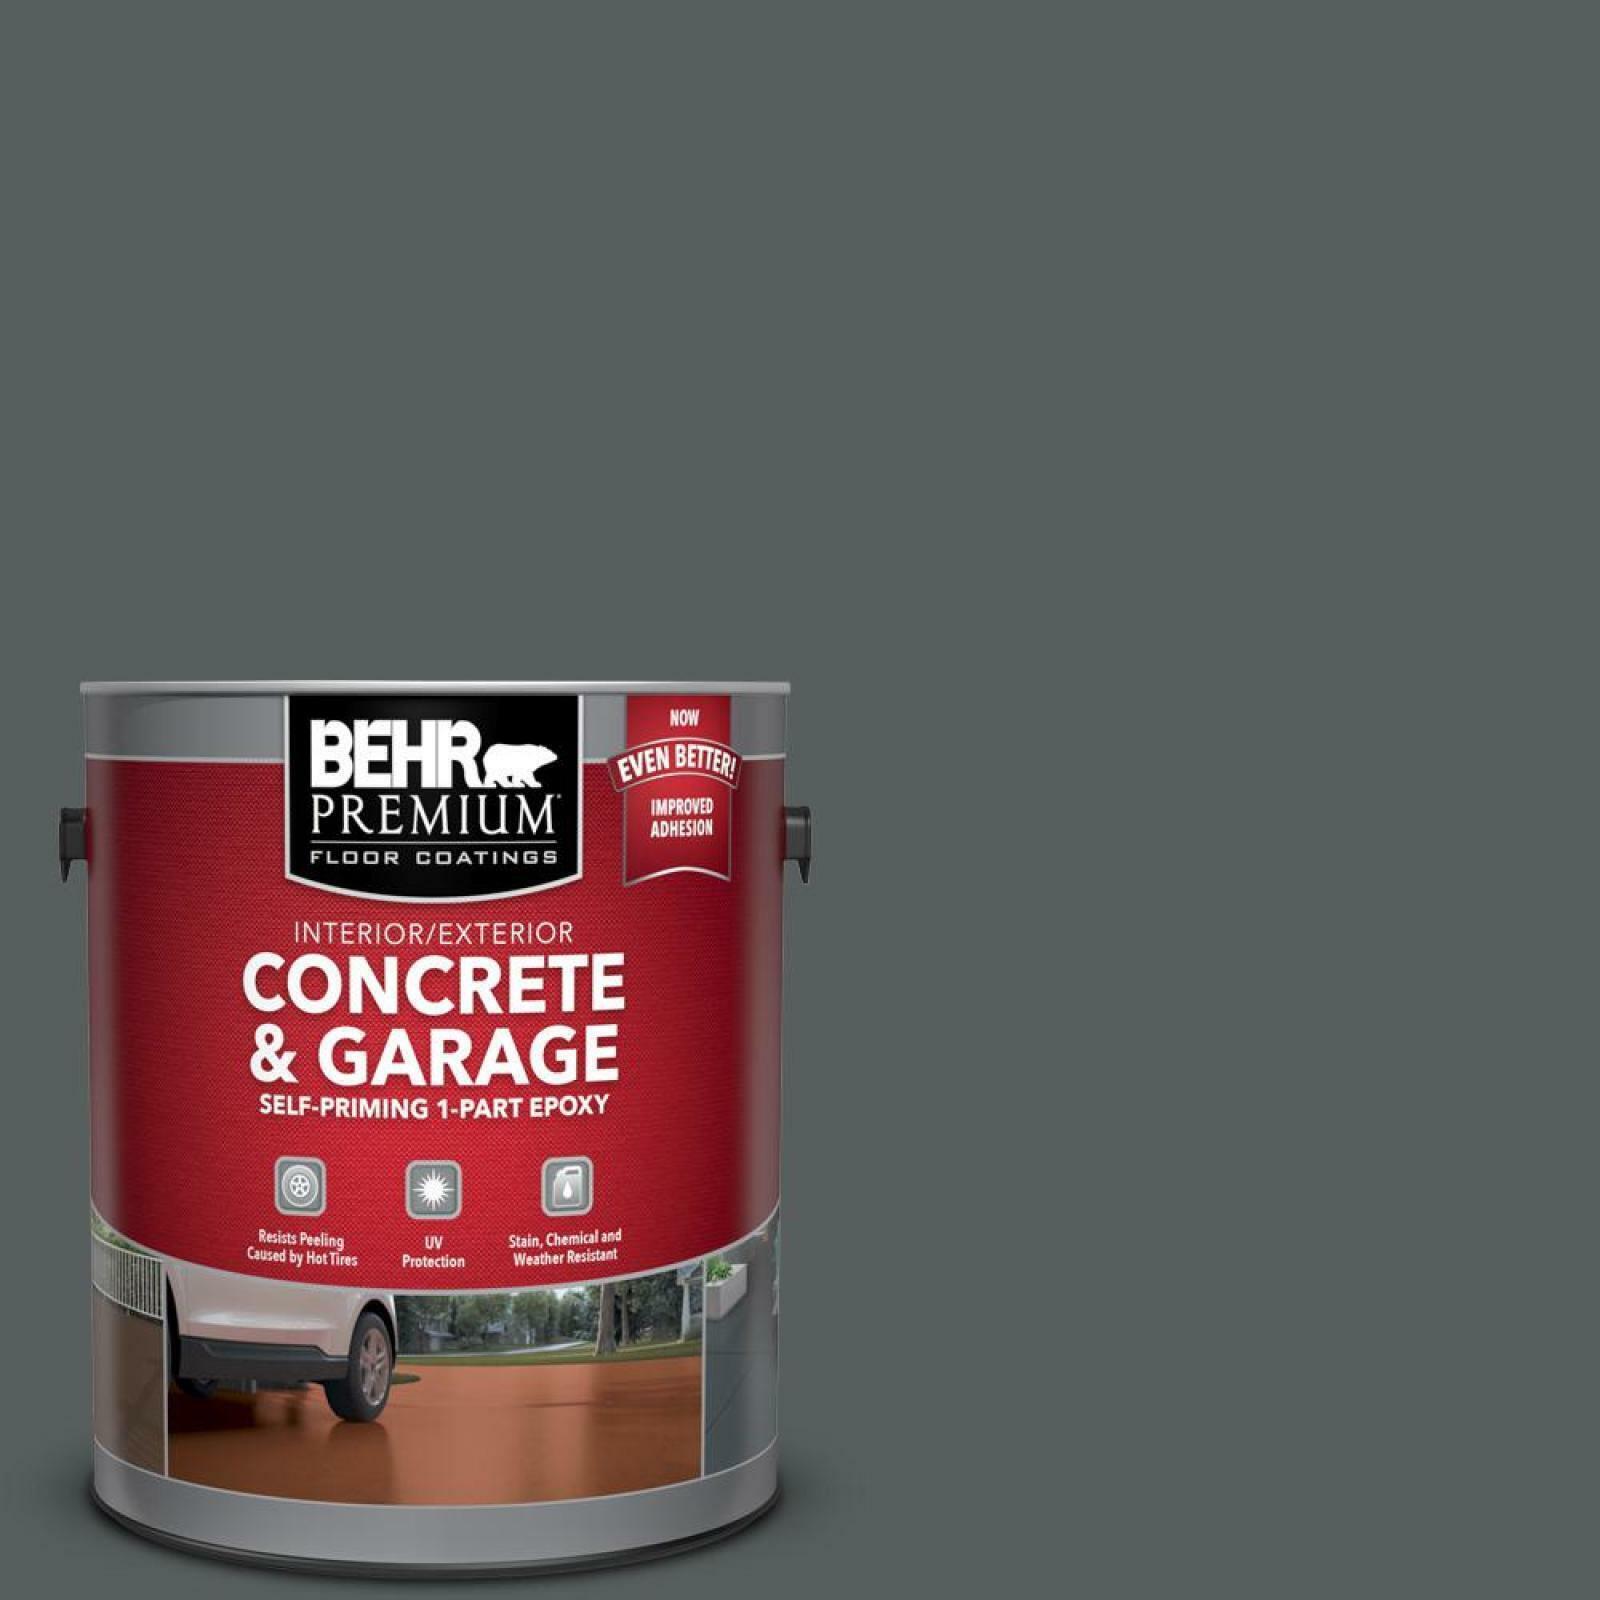 Charcoal Gray Paint >> Details About Charcoal Gray Epoxy Paint Concrete Garage Floor Porch Deck Acrylic Satin Coating